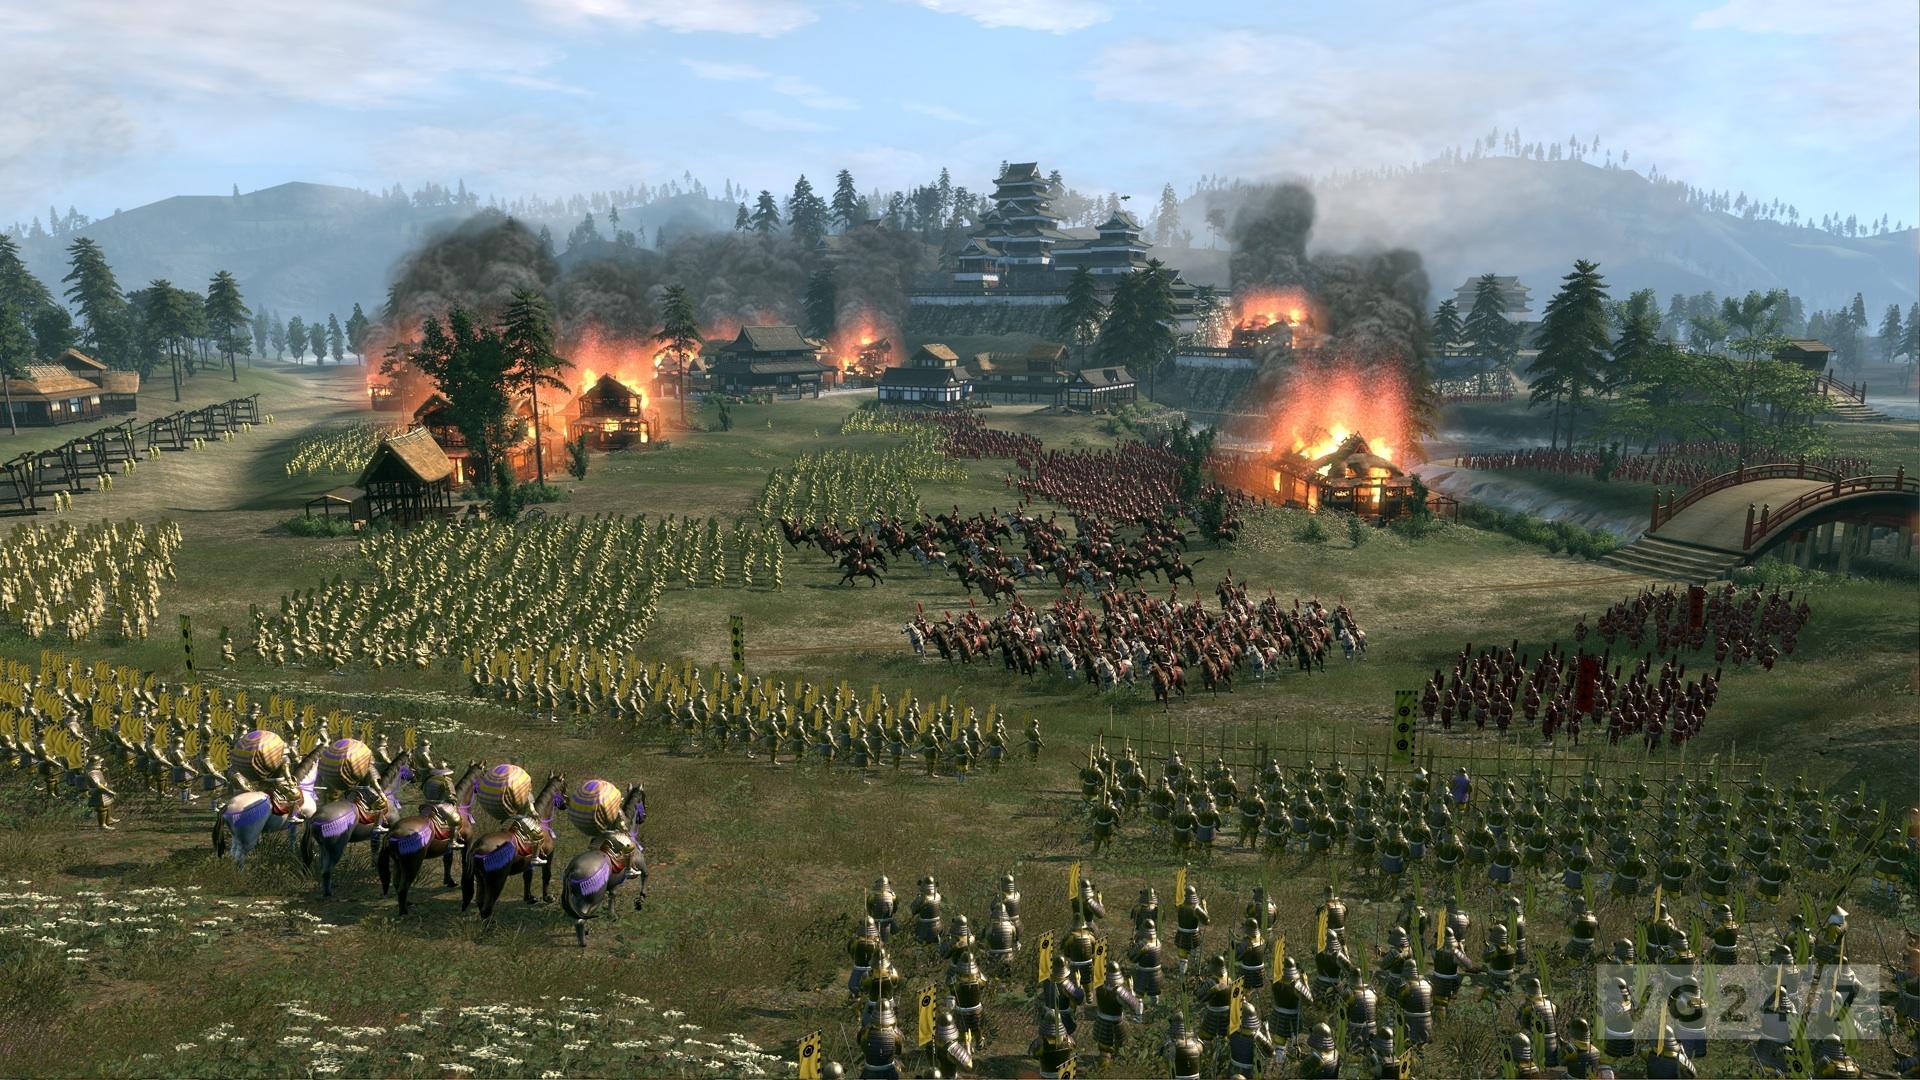 Total War Shogun 2 Fall Of The Samurai Wallpaper Hd Total War Shogun 2 Gold Edition R G Catalyst One2up